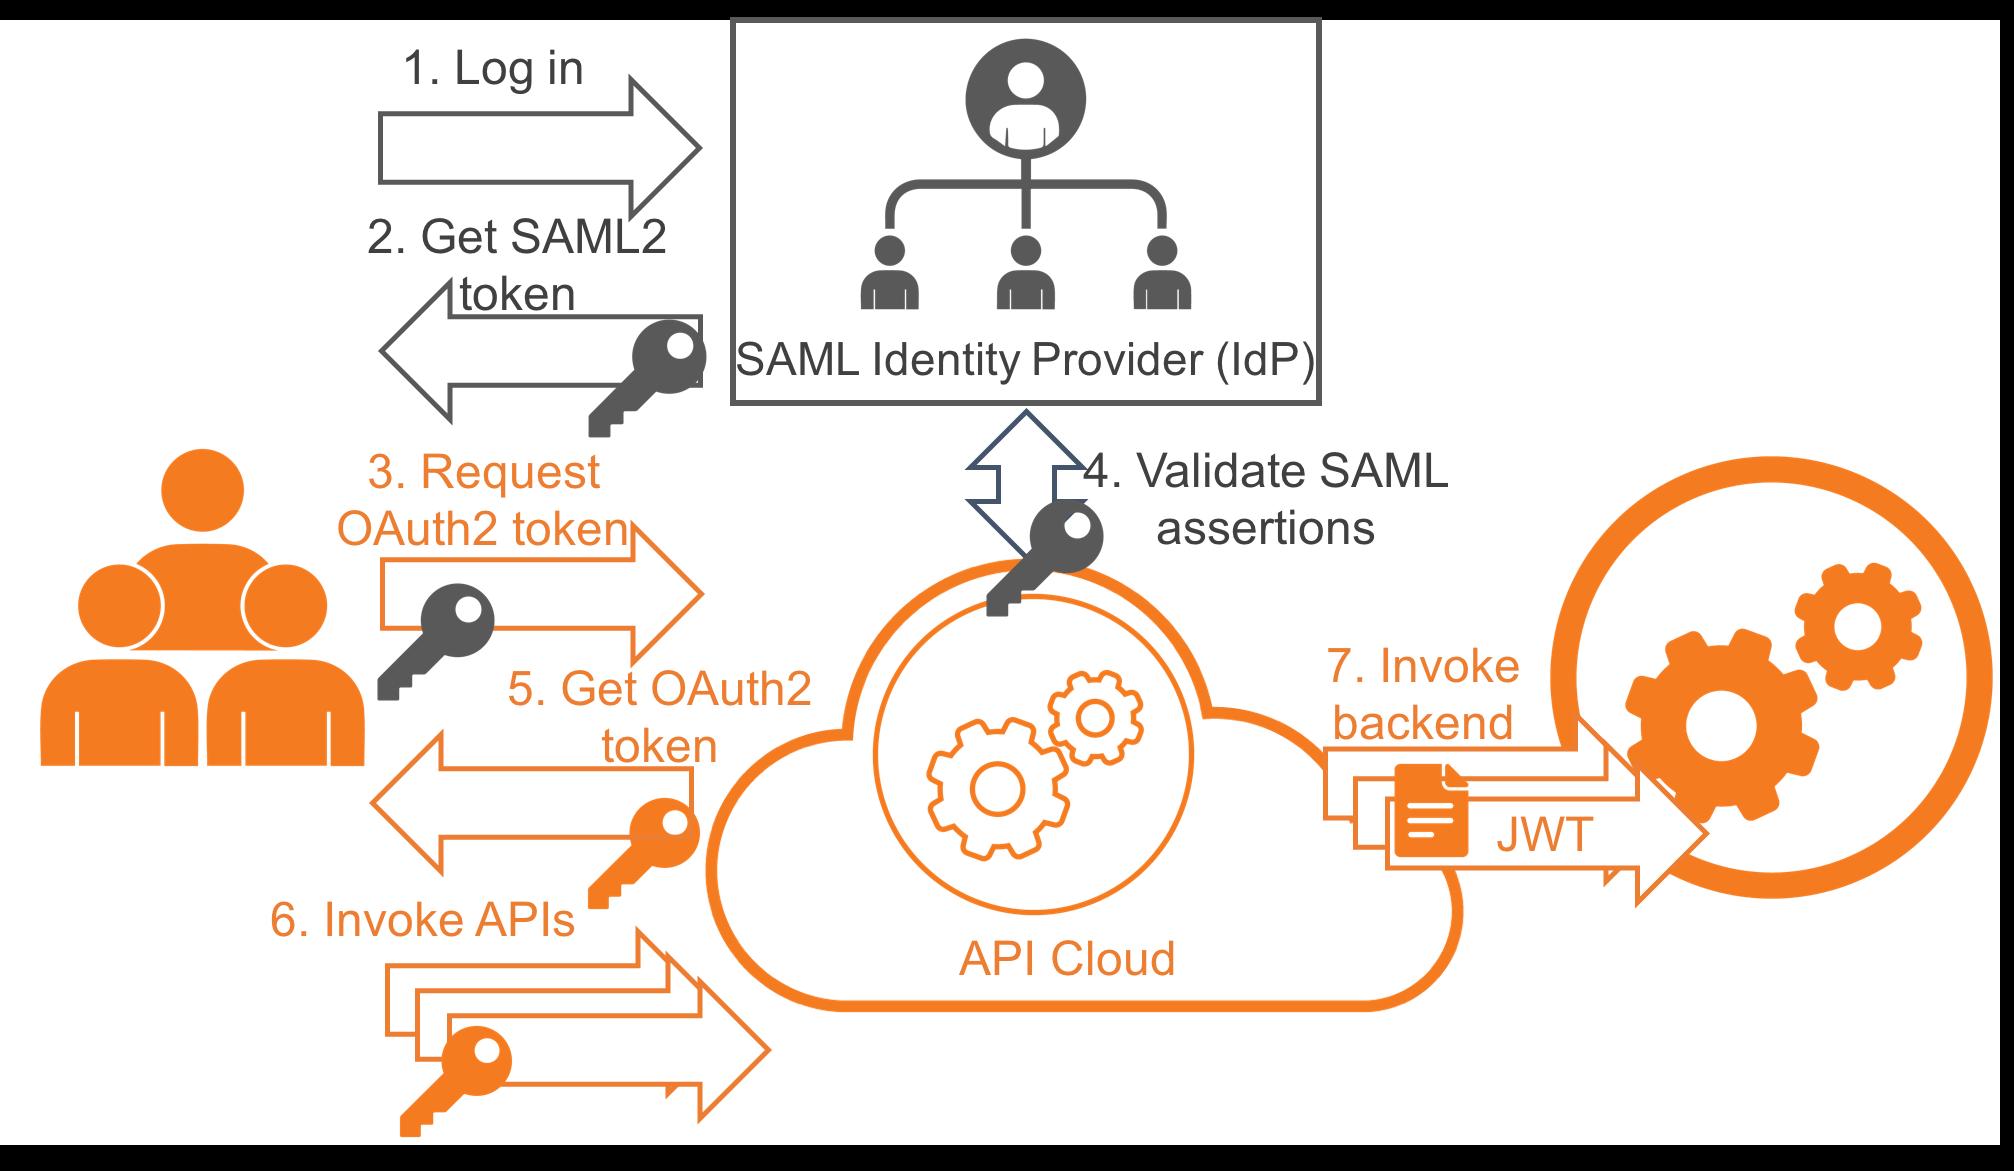 Integrating OAuth API Gateway with SAML Identity Provider